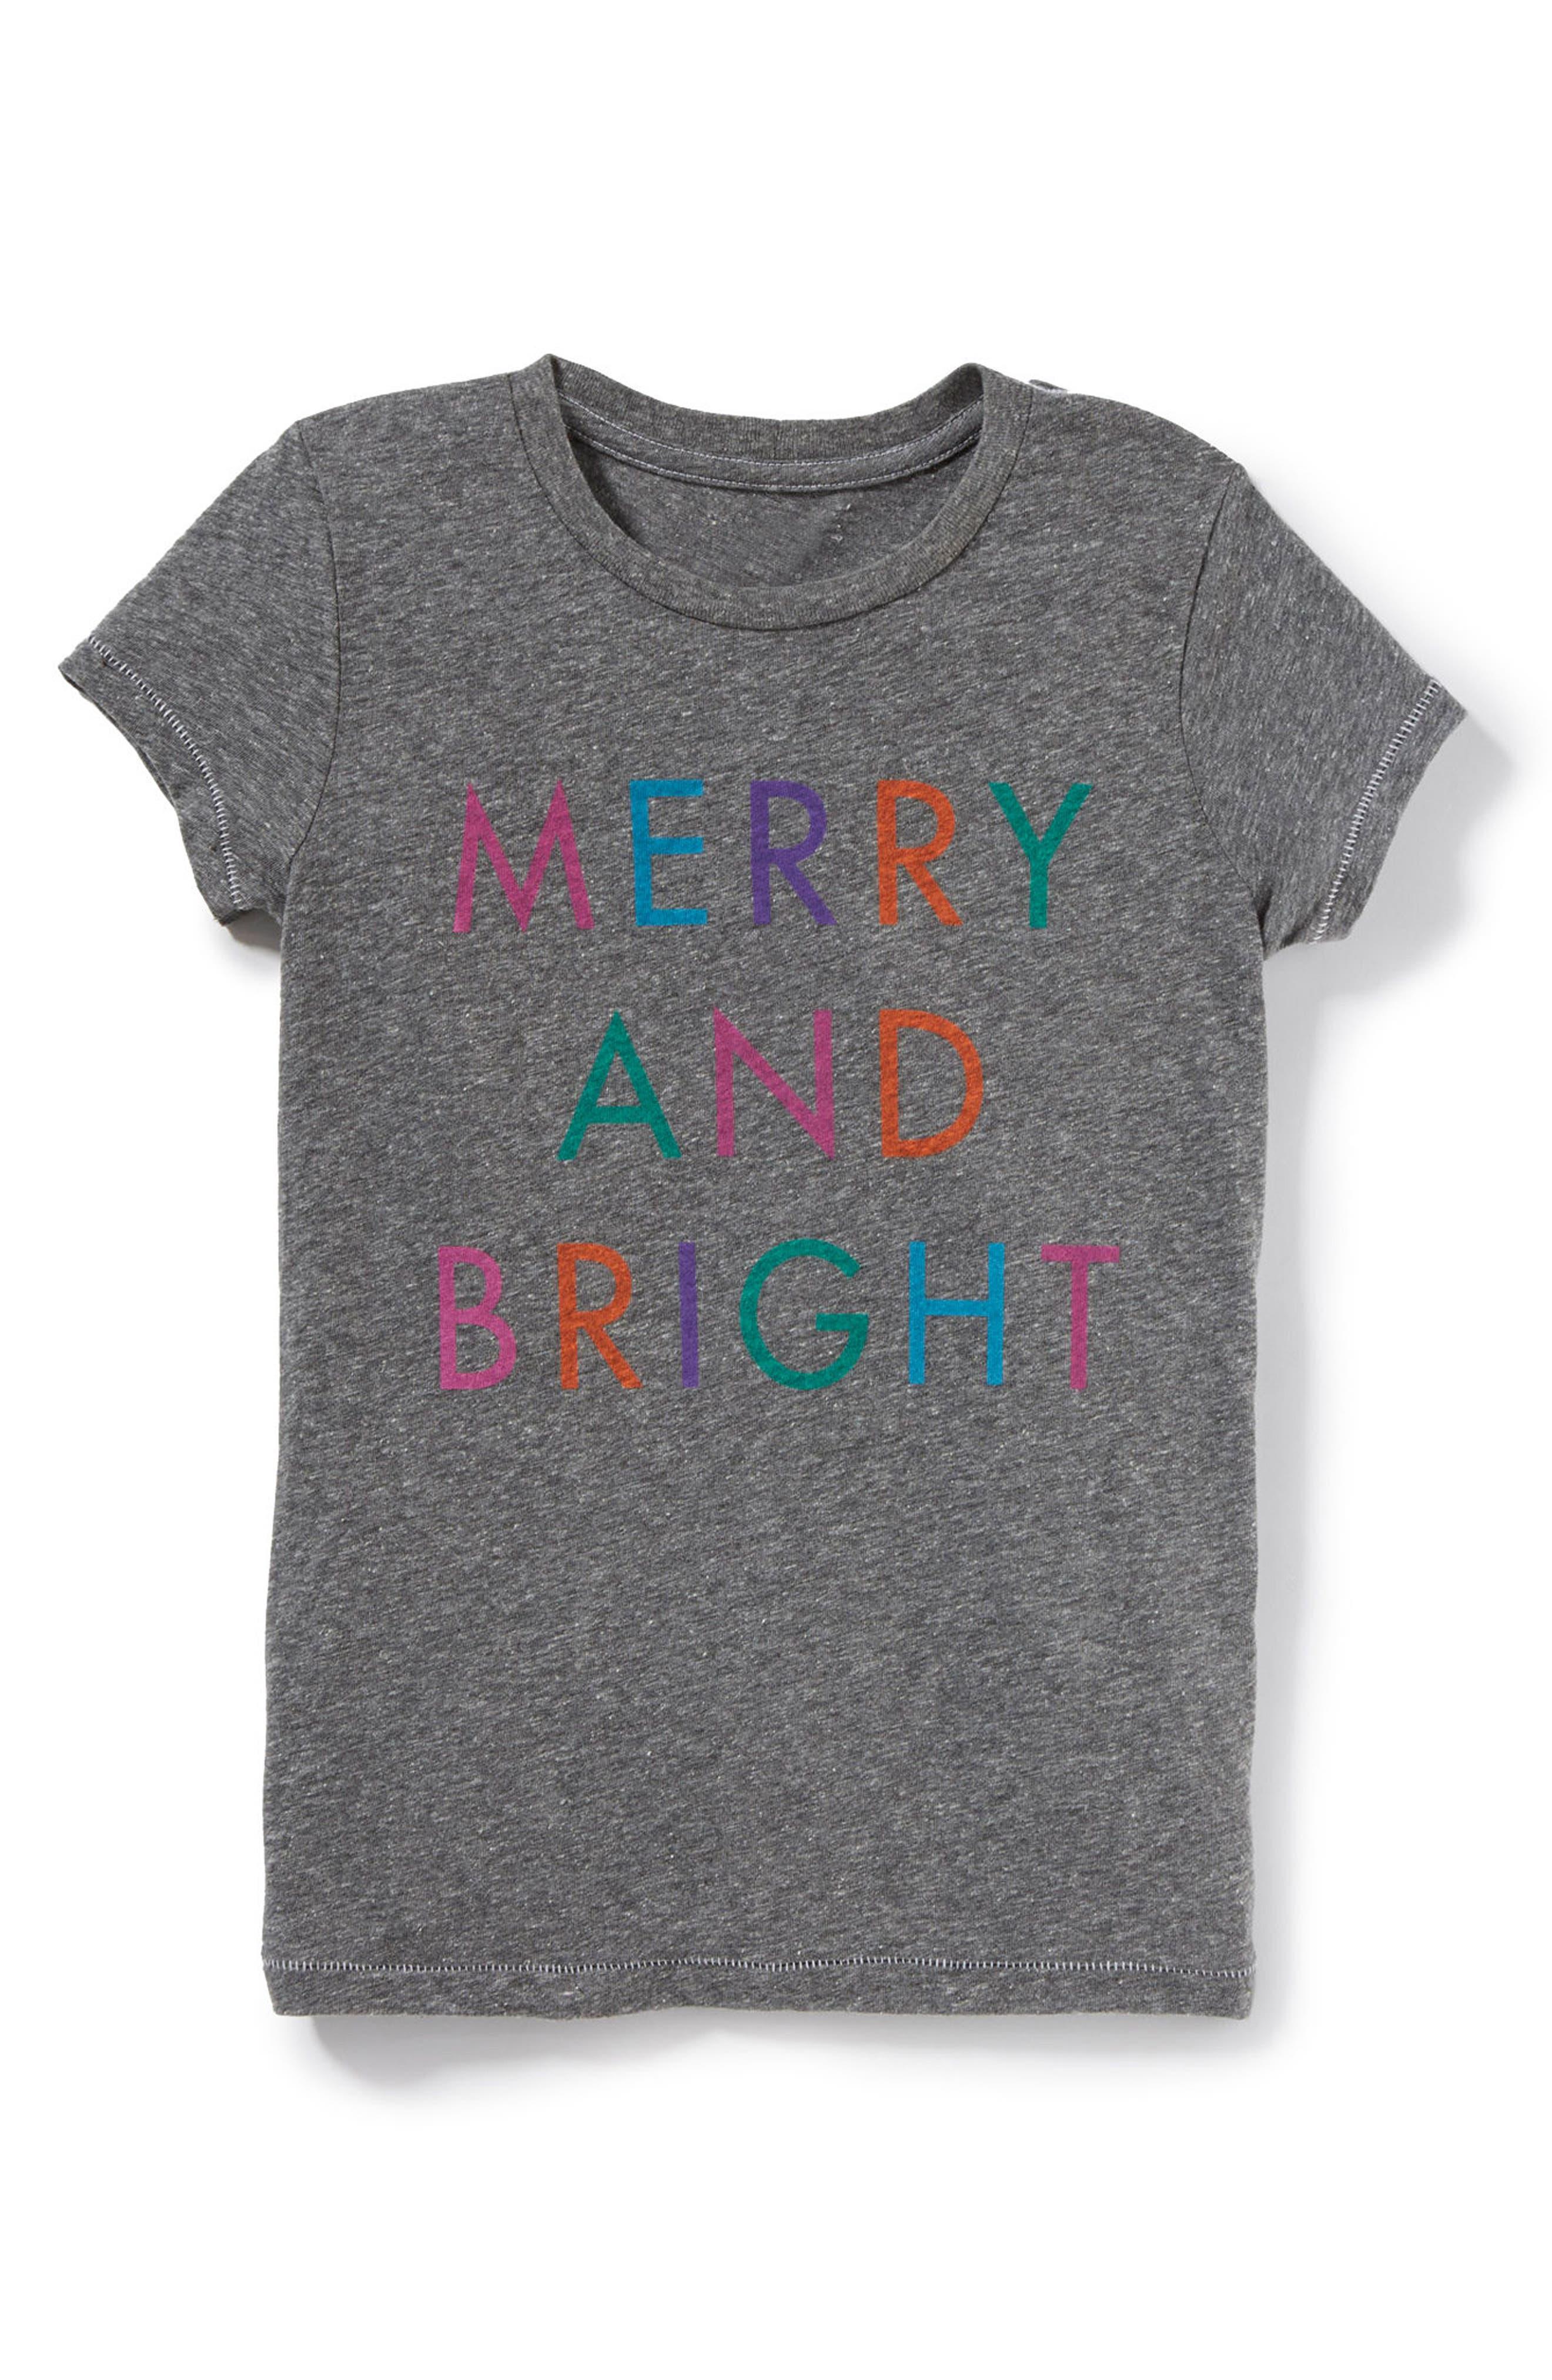 Main Image - Peek Merry & Bright Graphic Tee (Toddler Girls, Little Girls & Big Girls)